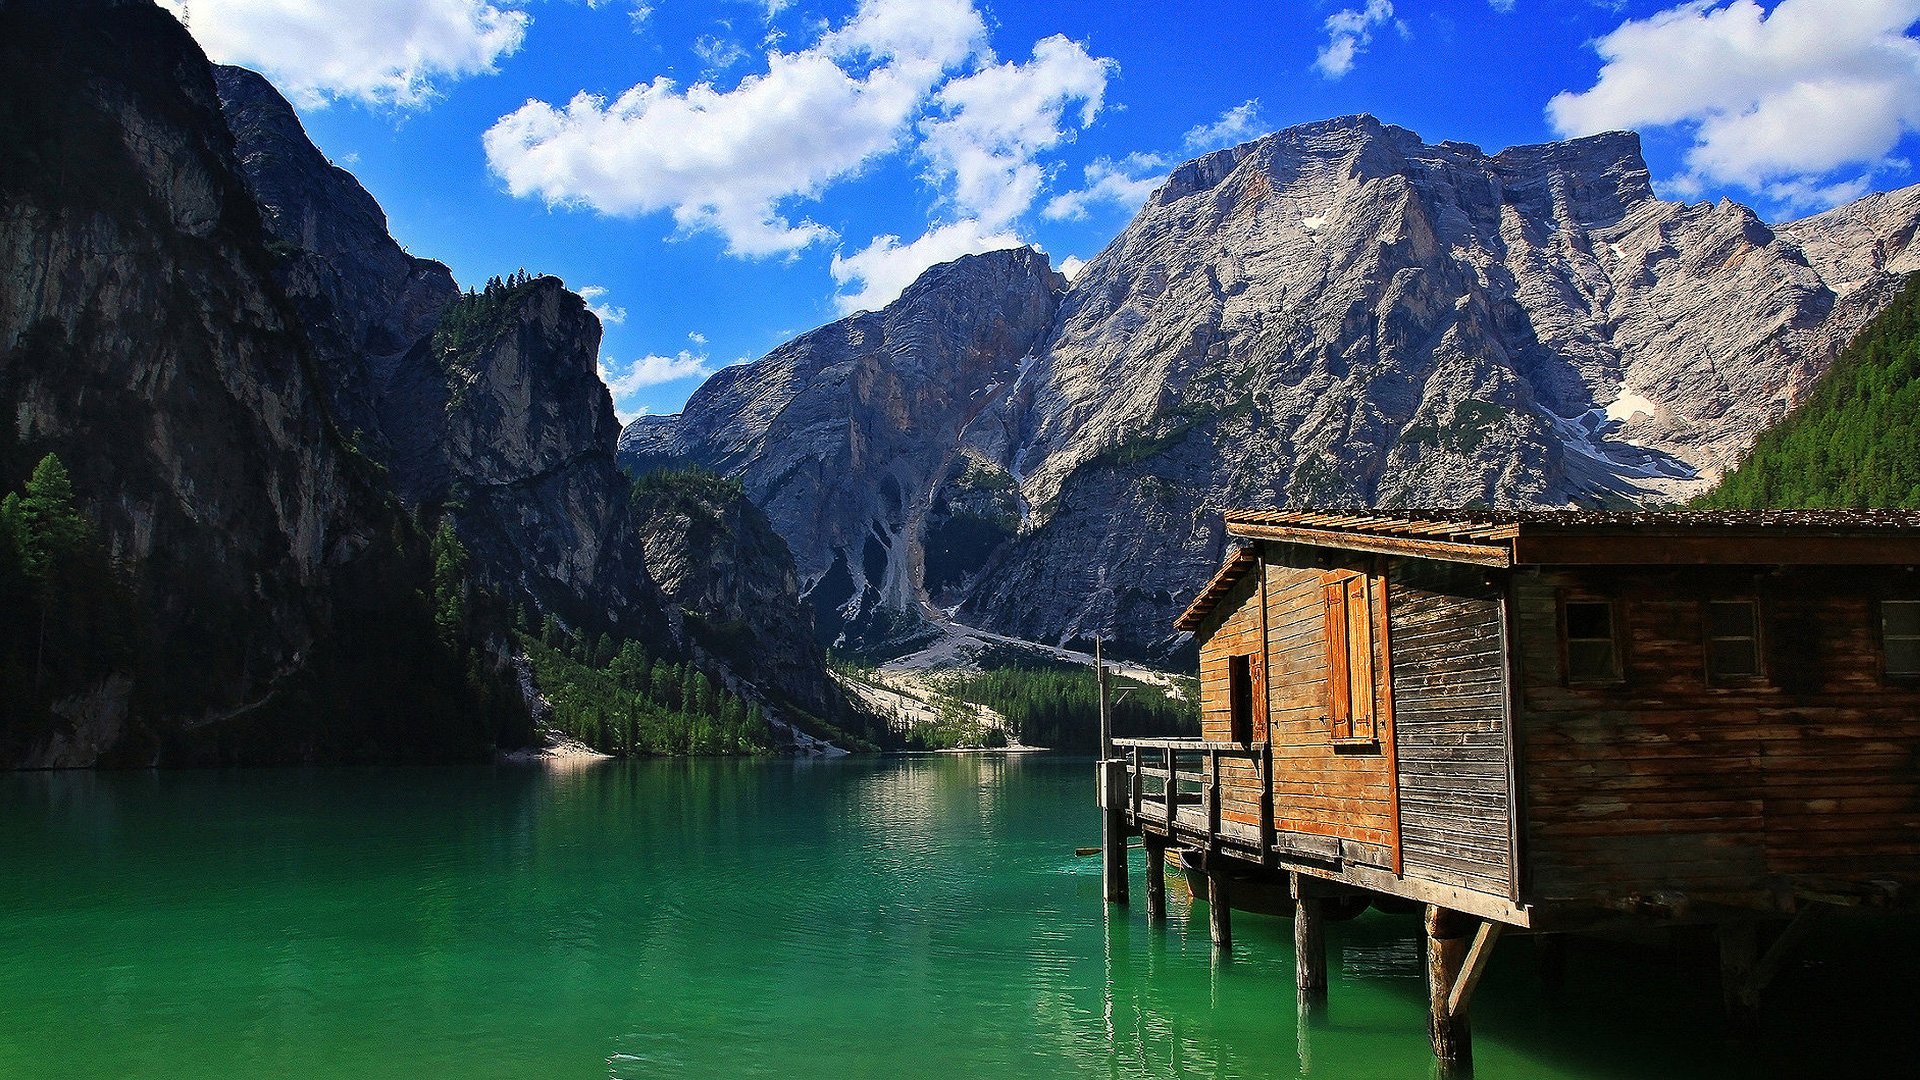 cabin on a mountain lake wallpaper 747350 stilt cabin lake mountain 1920x1080